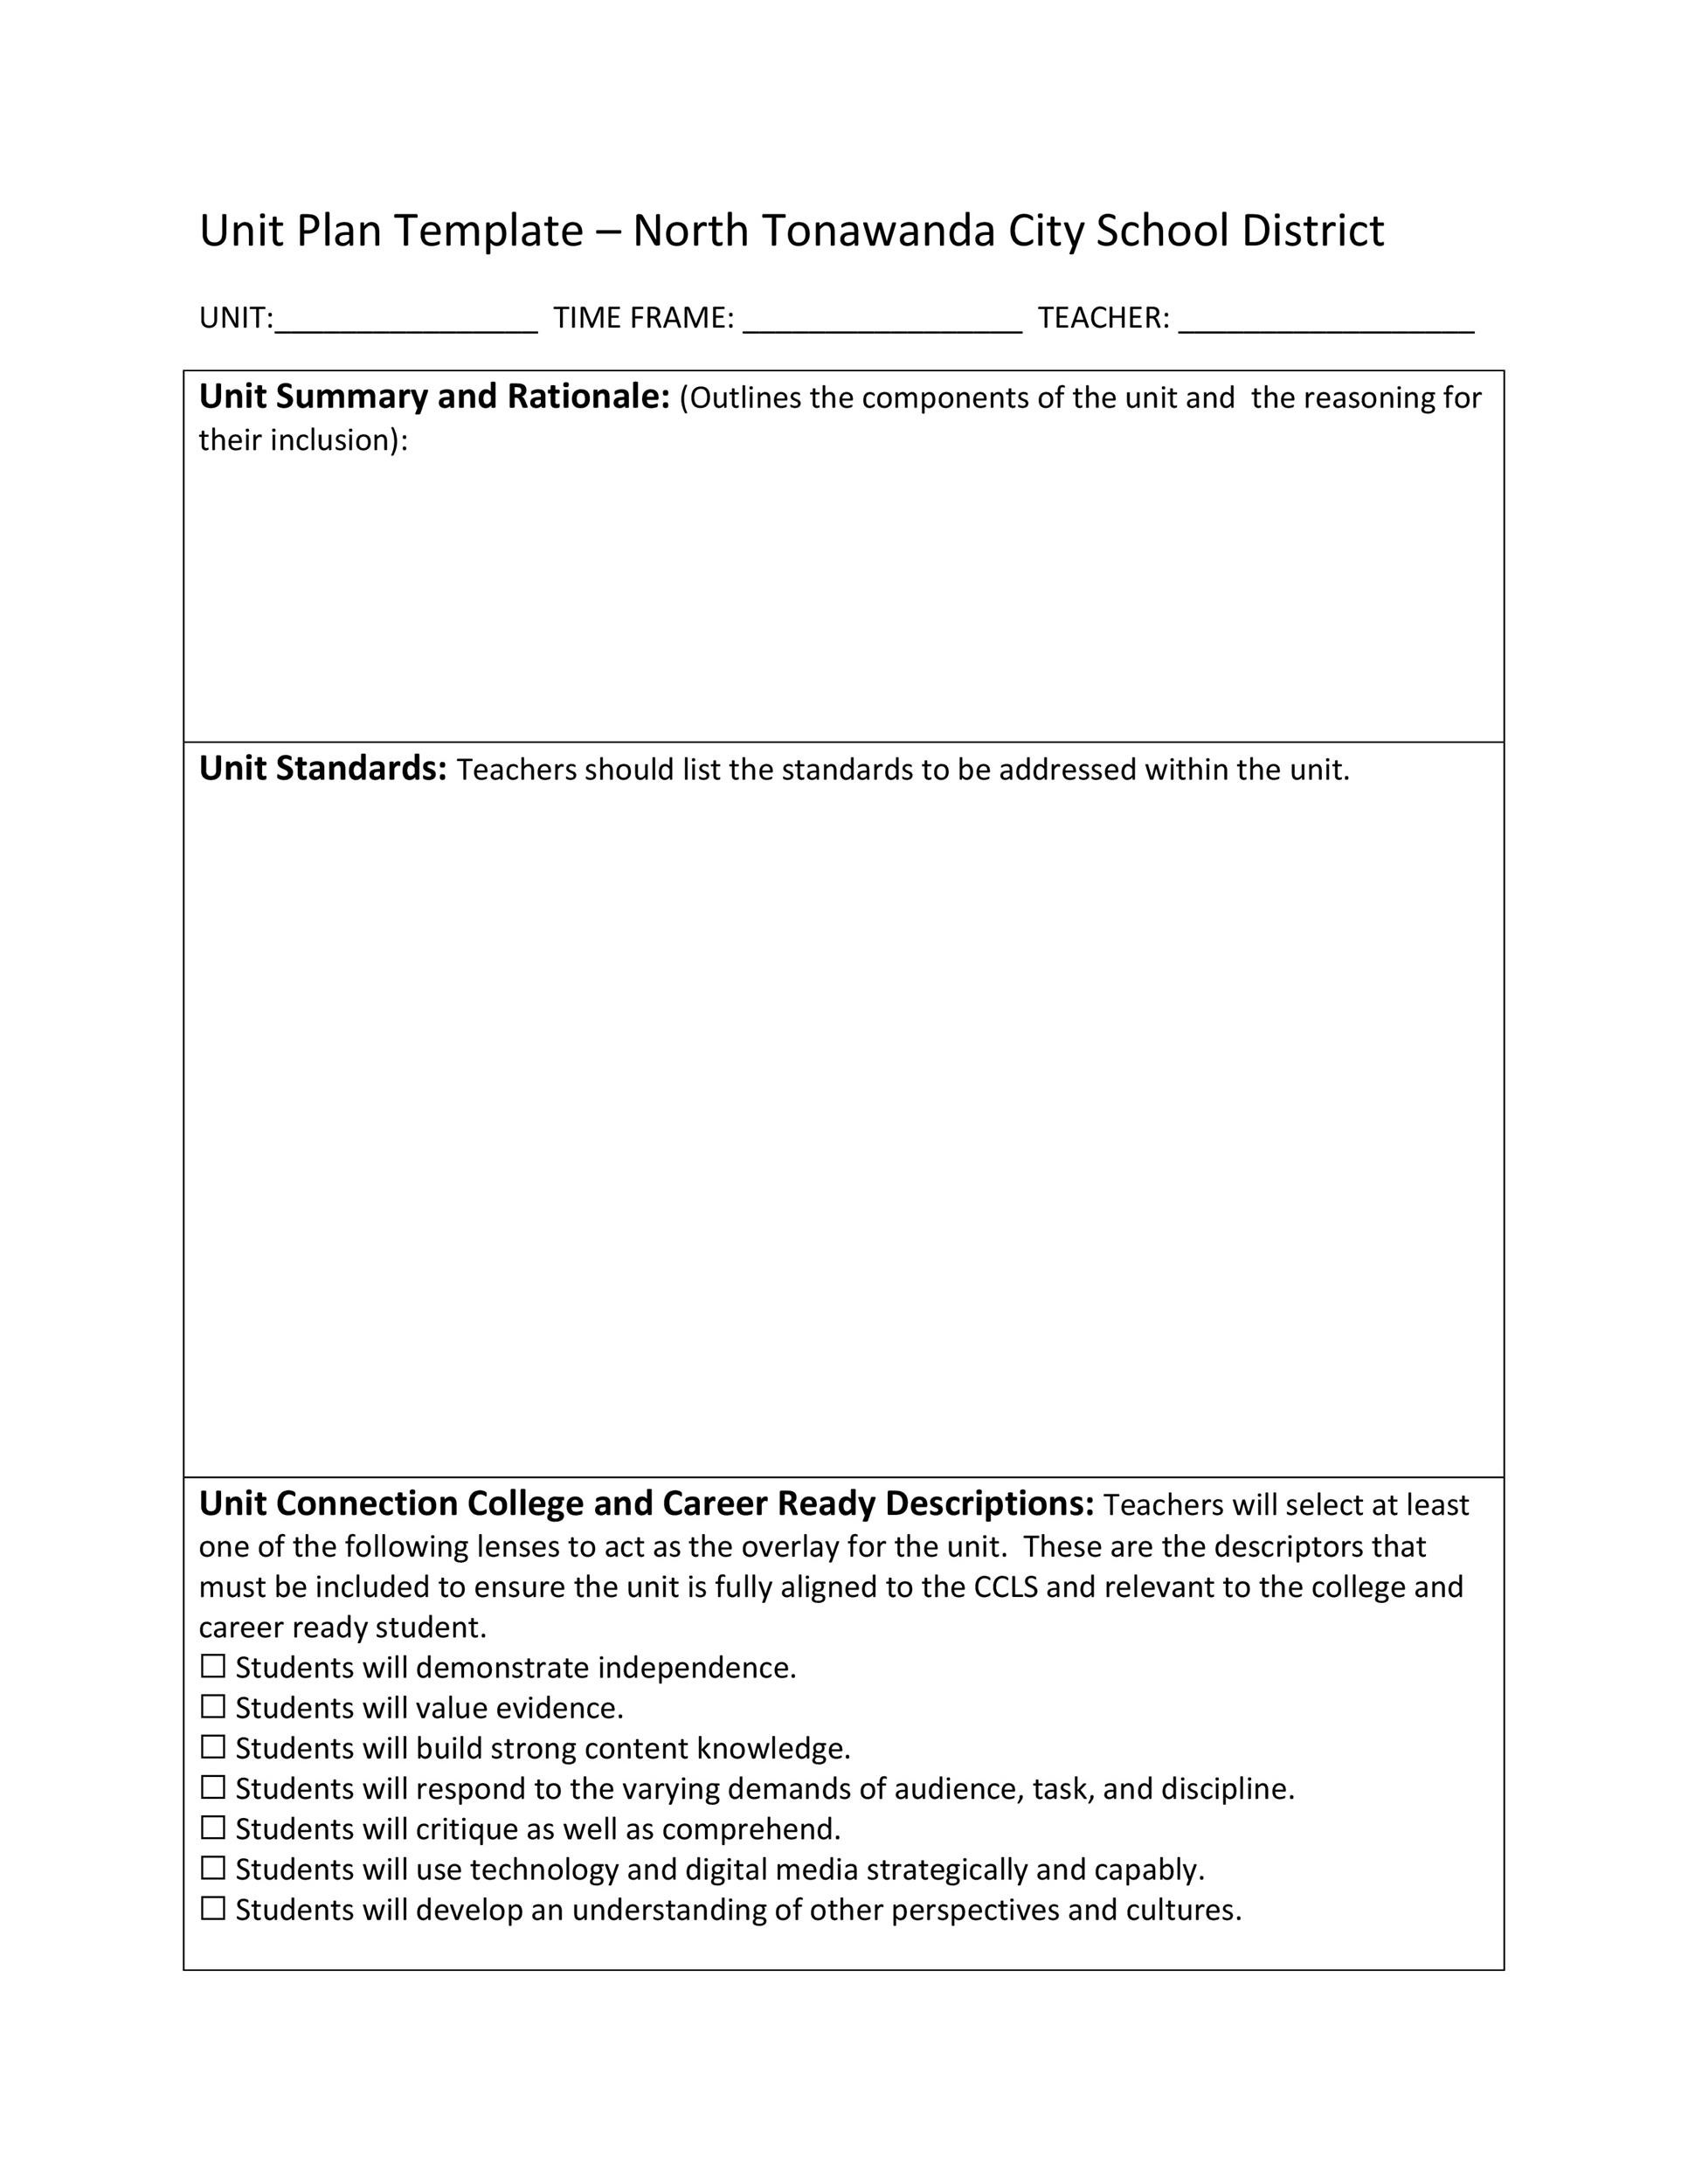 Free unit plan template 10